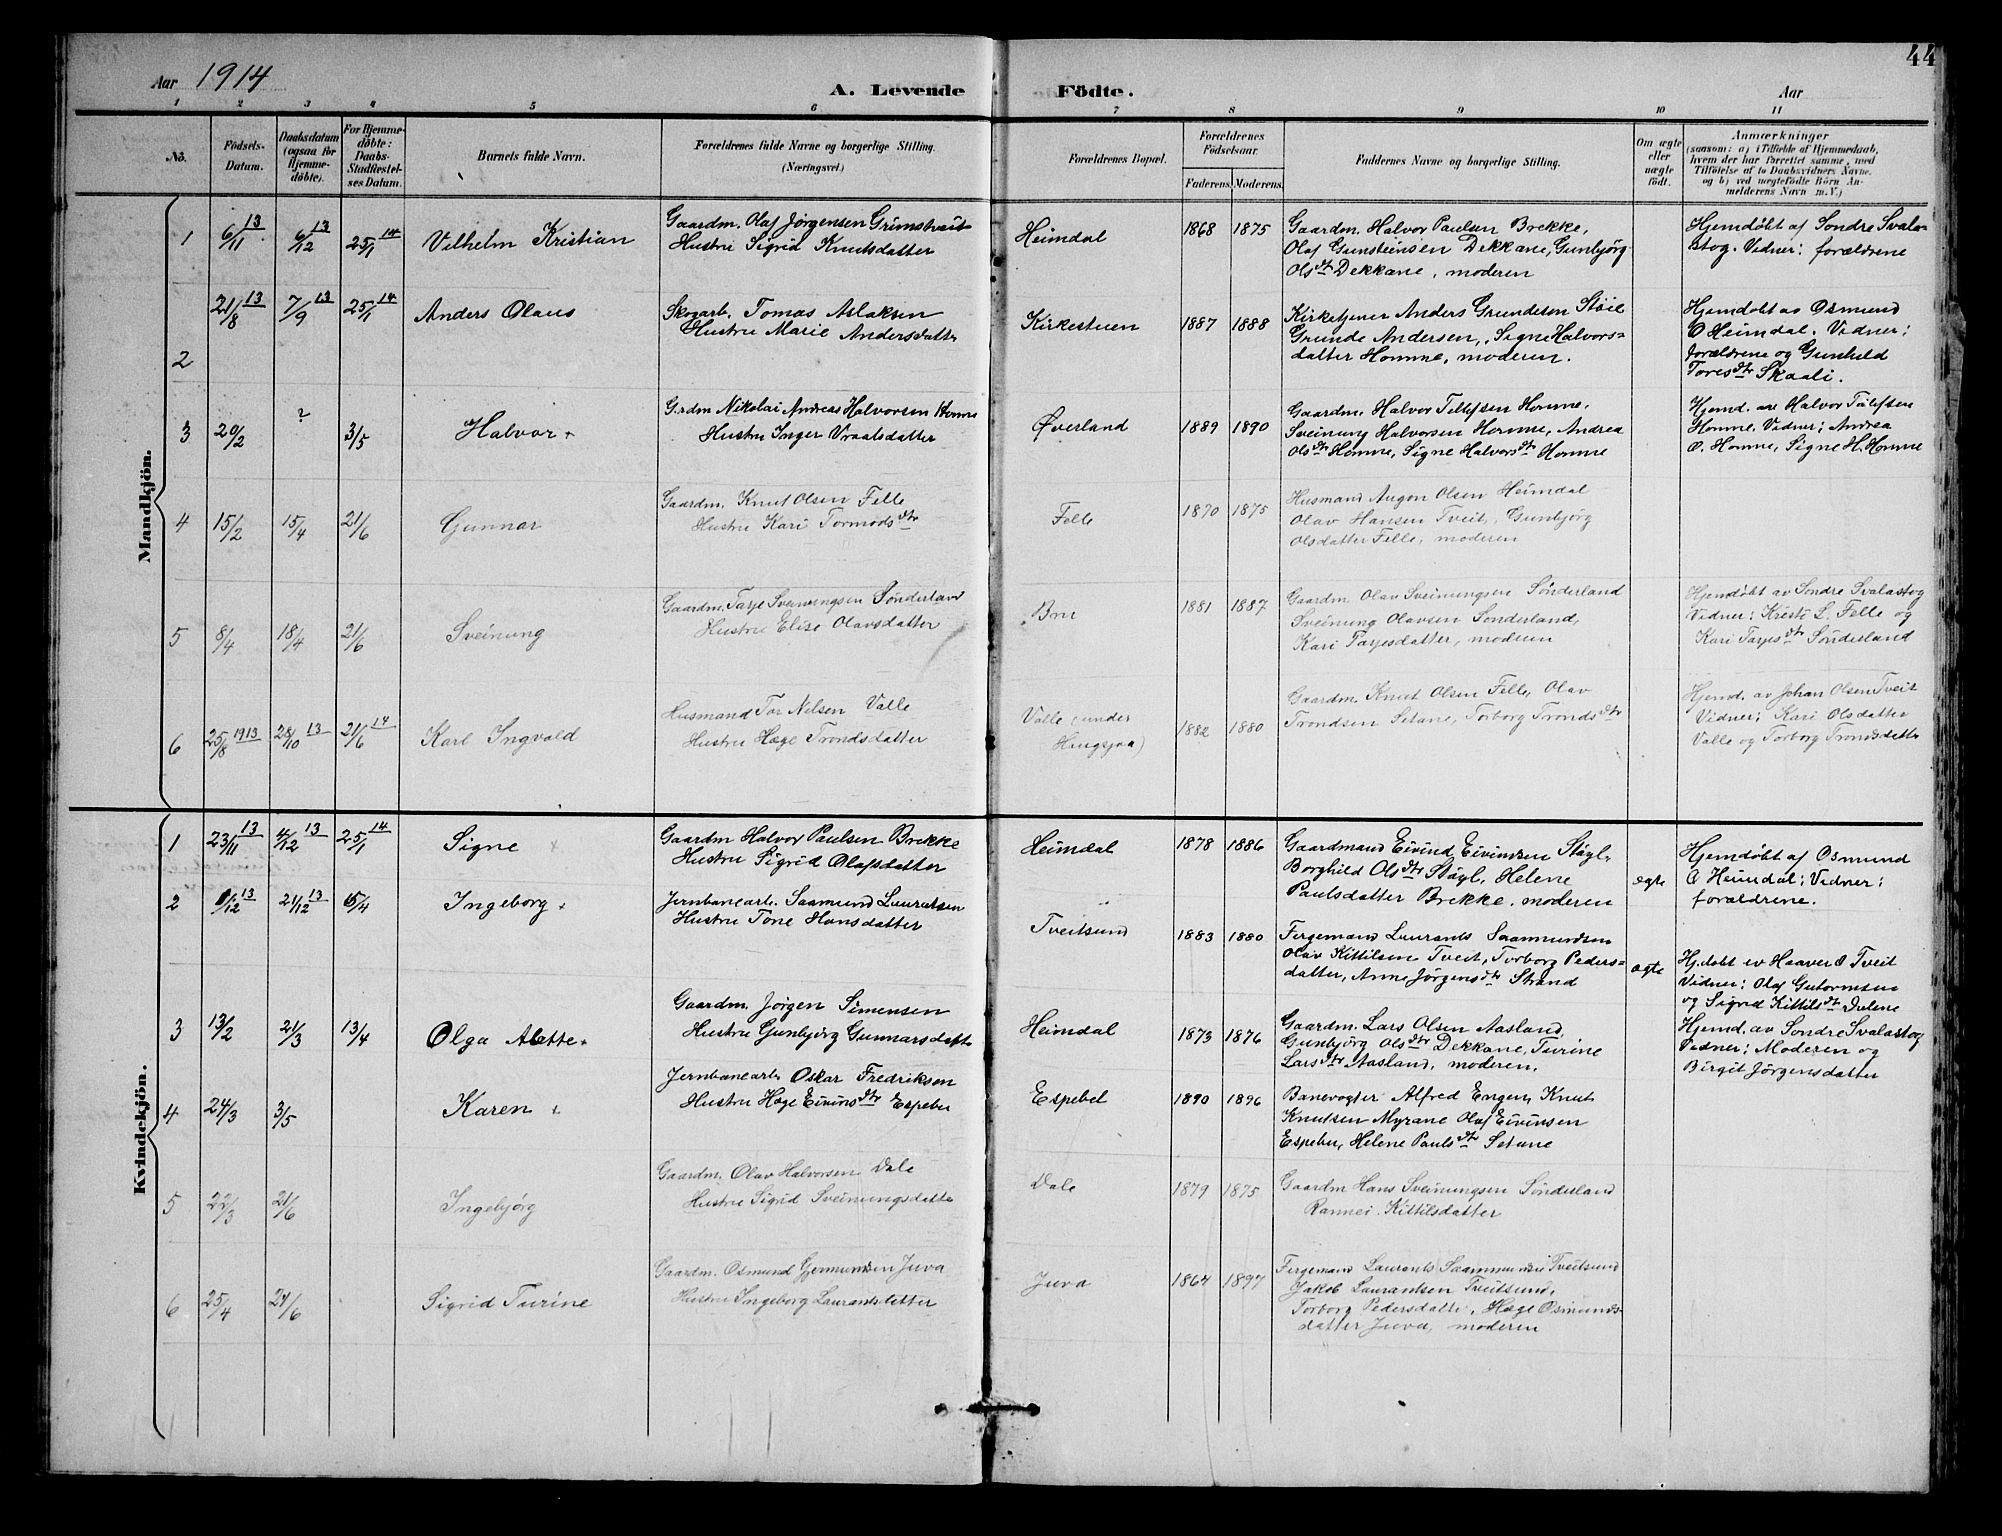 SAKO, Nissedal kirkebøker, G/Gb/L0003: Klokkerbok nr. II 3, 1893-1928, s. 44